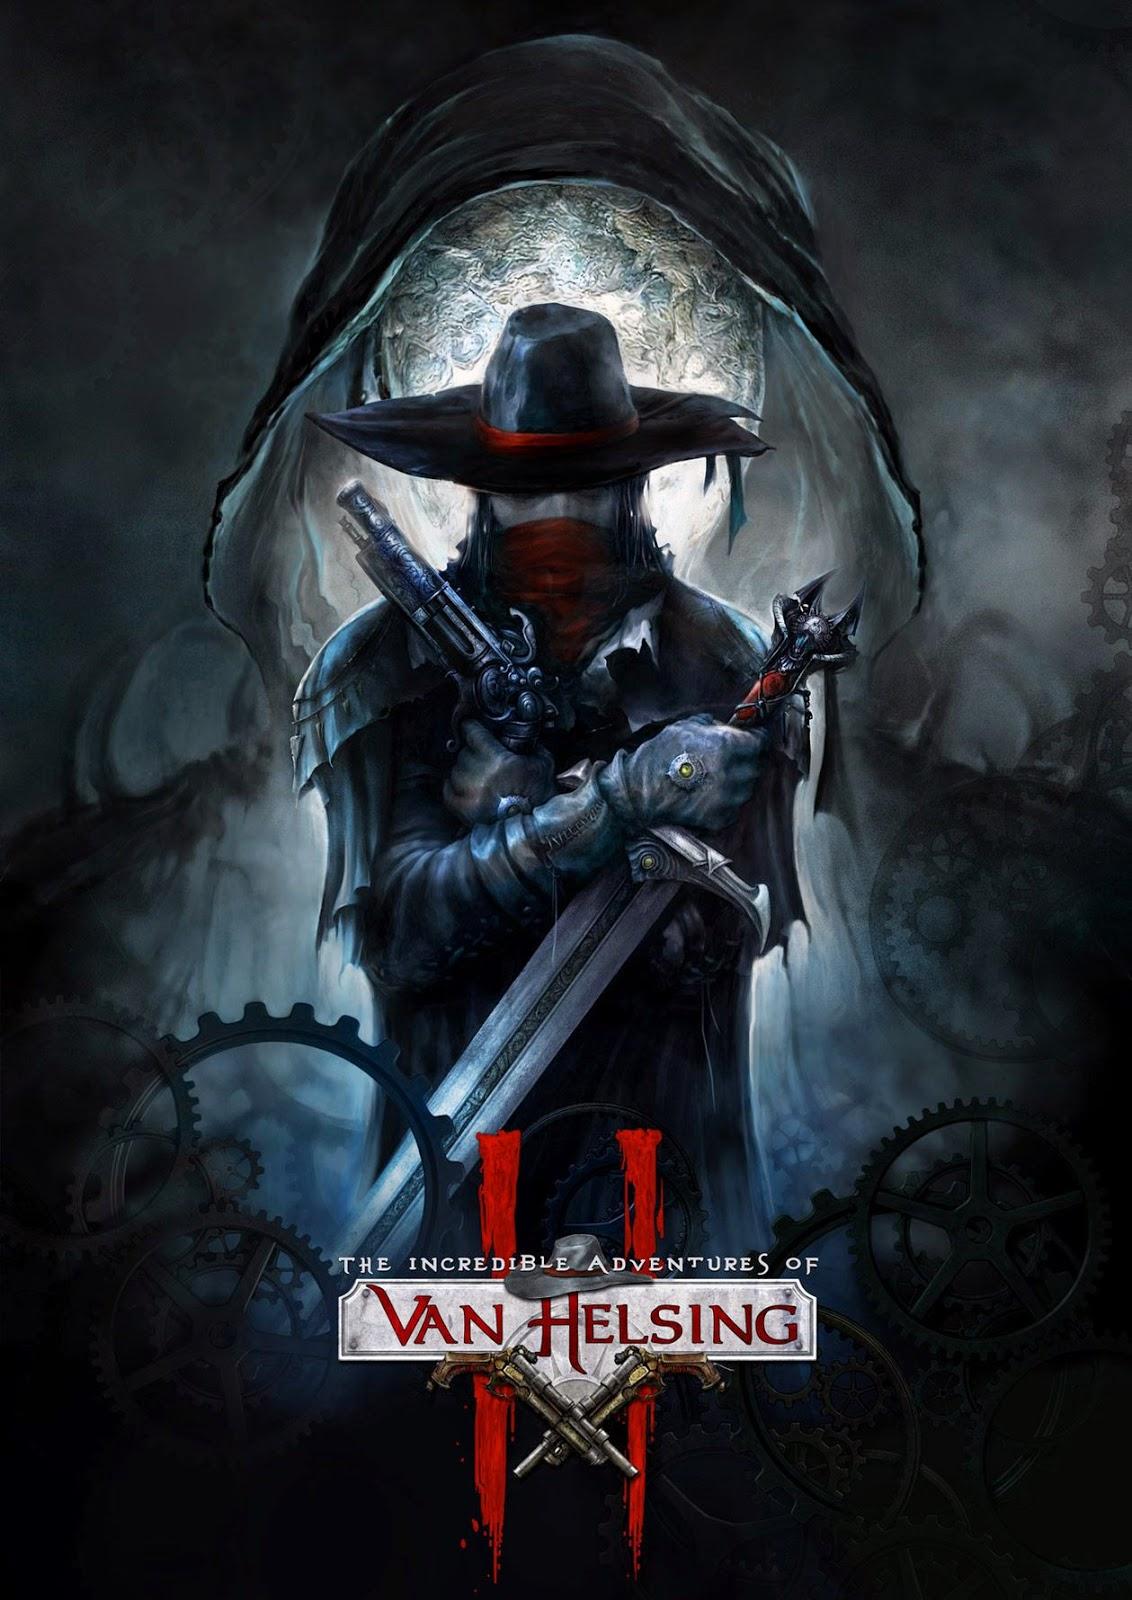 Van Helsing แวน เฮลซิง นักล่าล้างเผ่าพันธุ์ปีศาจ [HD][พากย์ไทย]